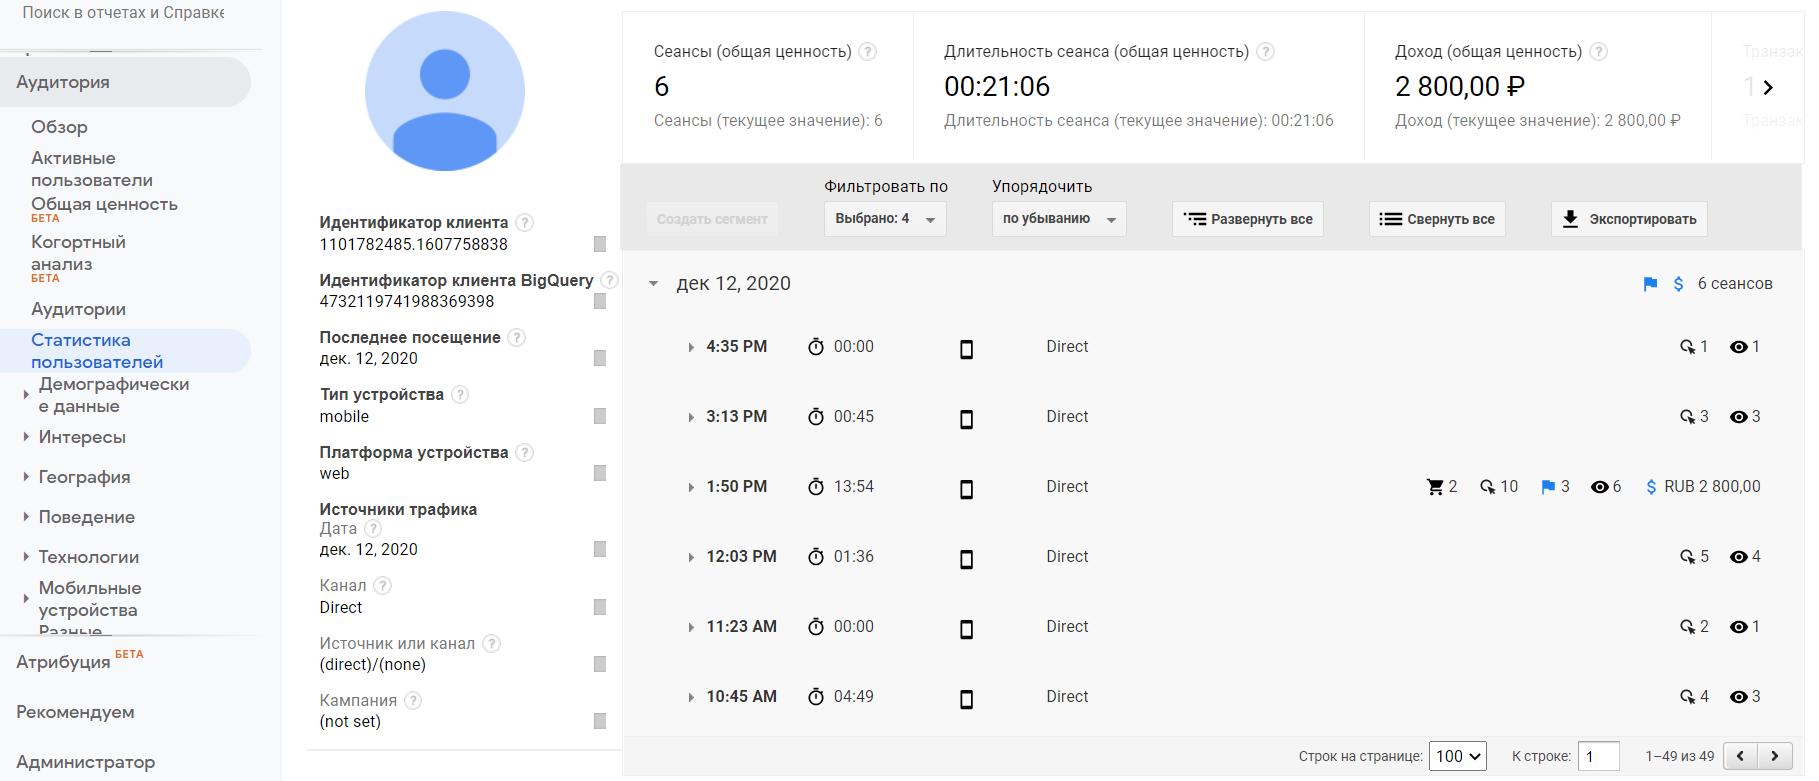 Client ID в Google Analytics 4